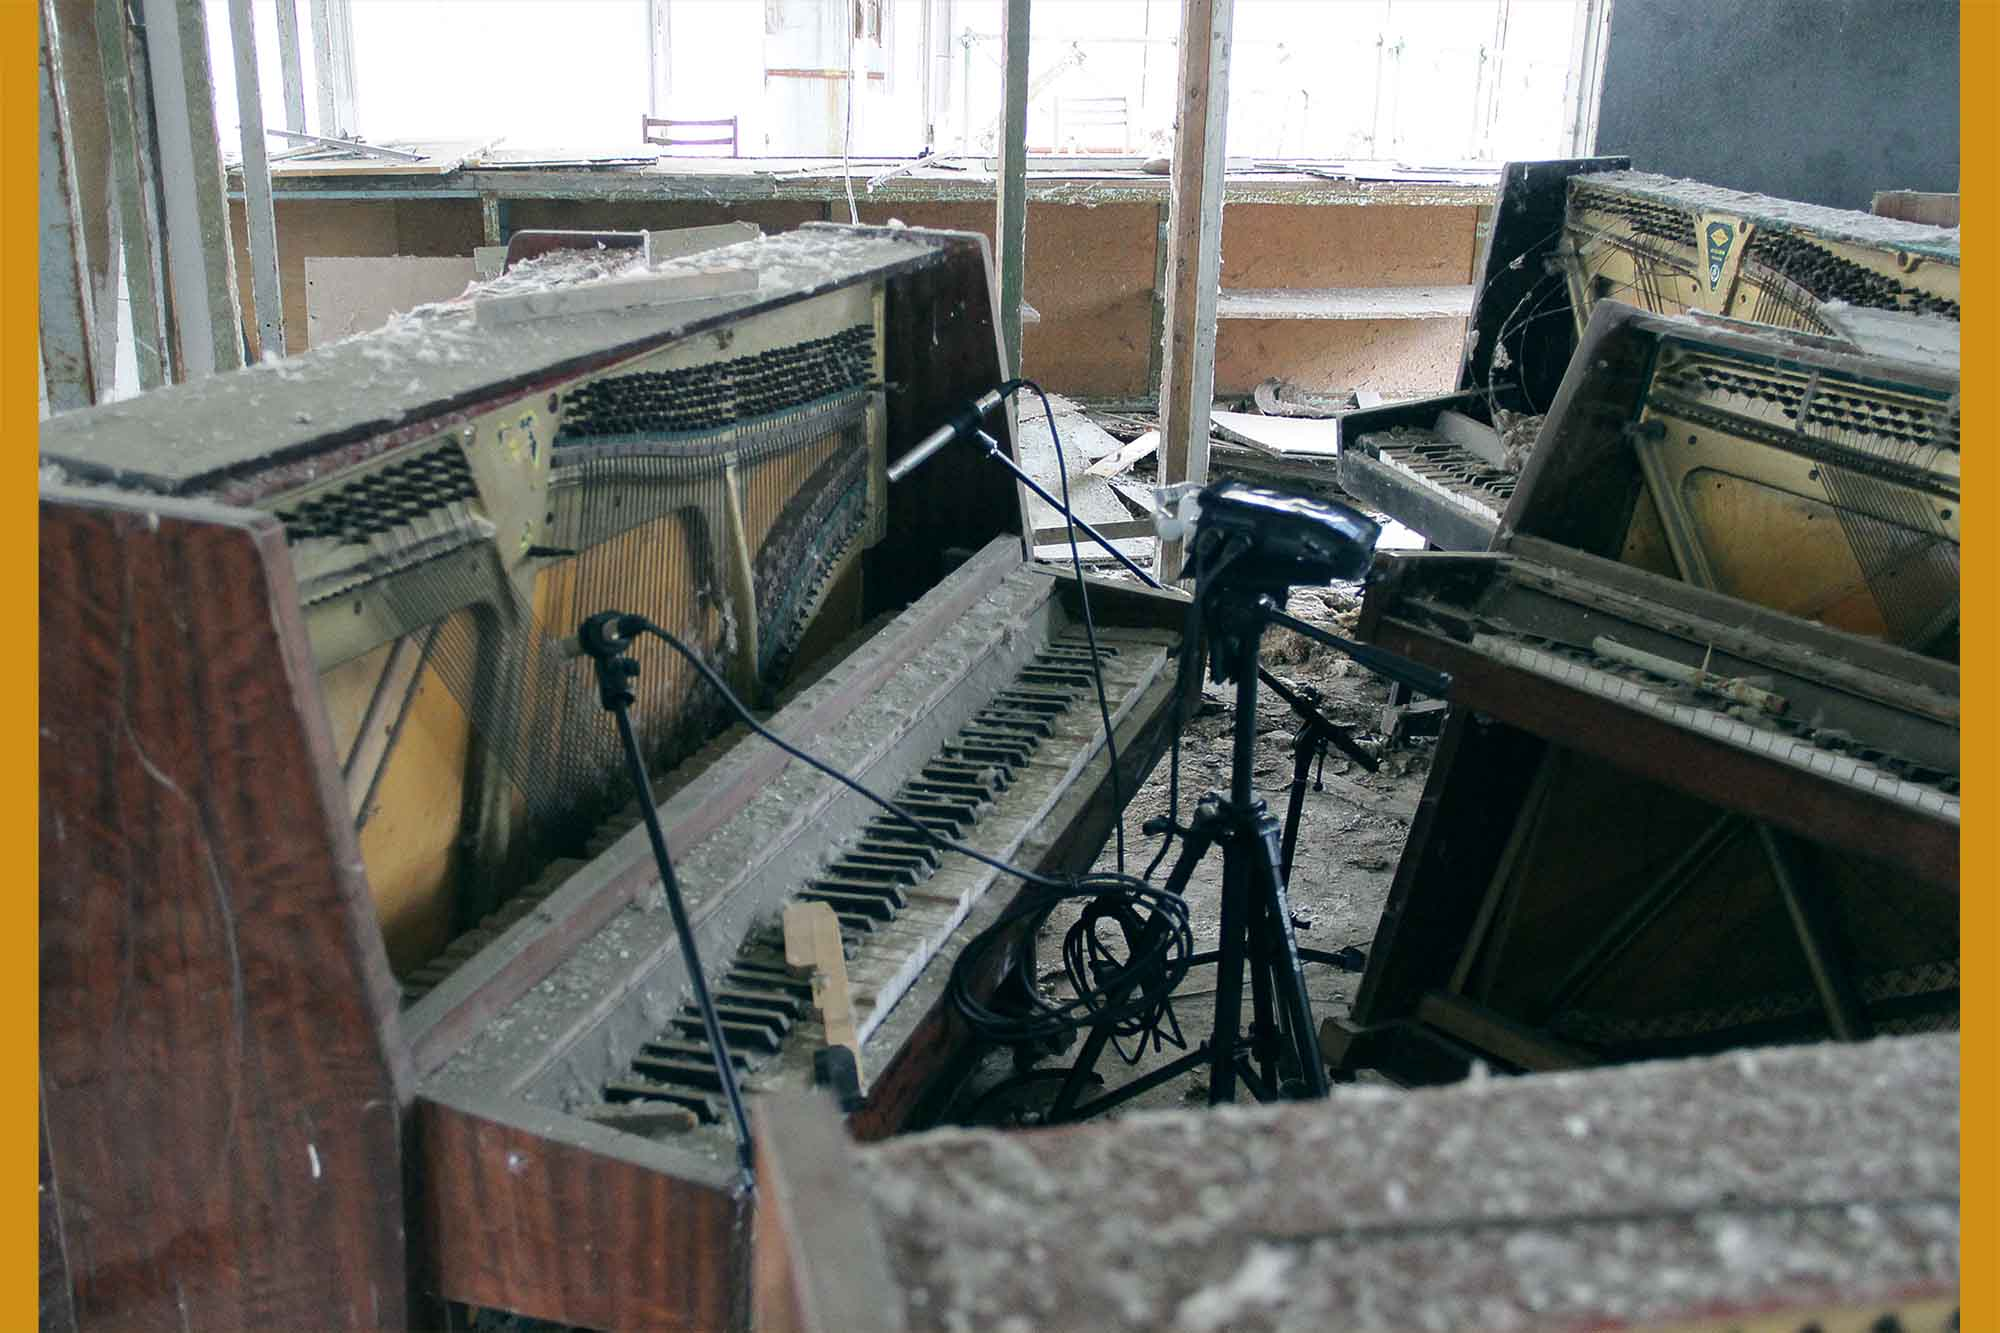 PRIPYAT Pianos – Radioactive Pianos from the Chernobyl